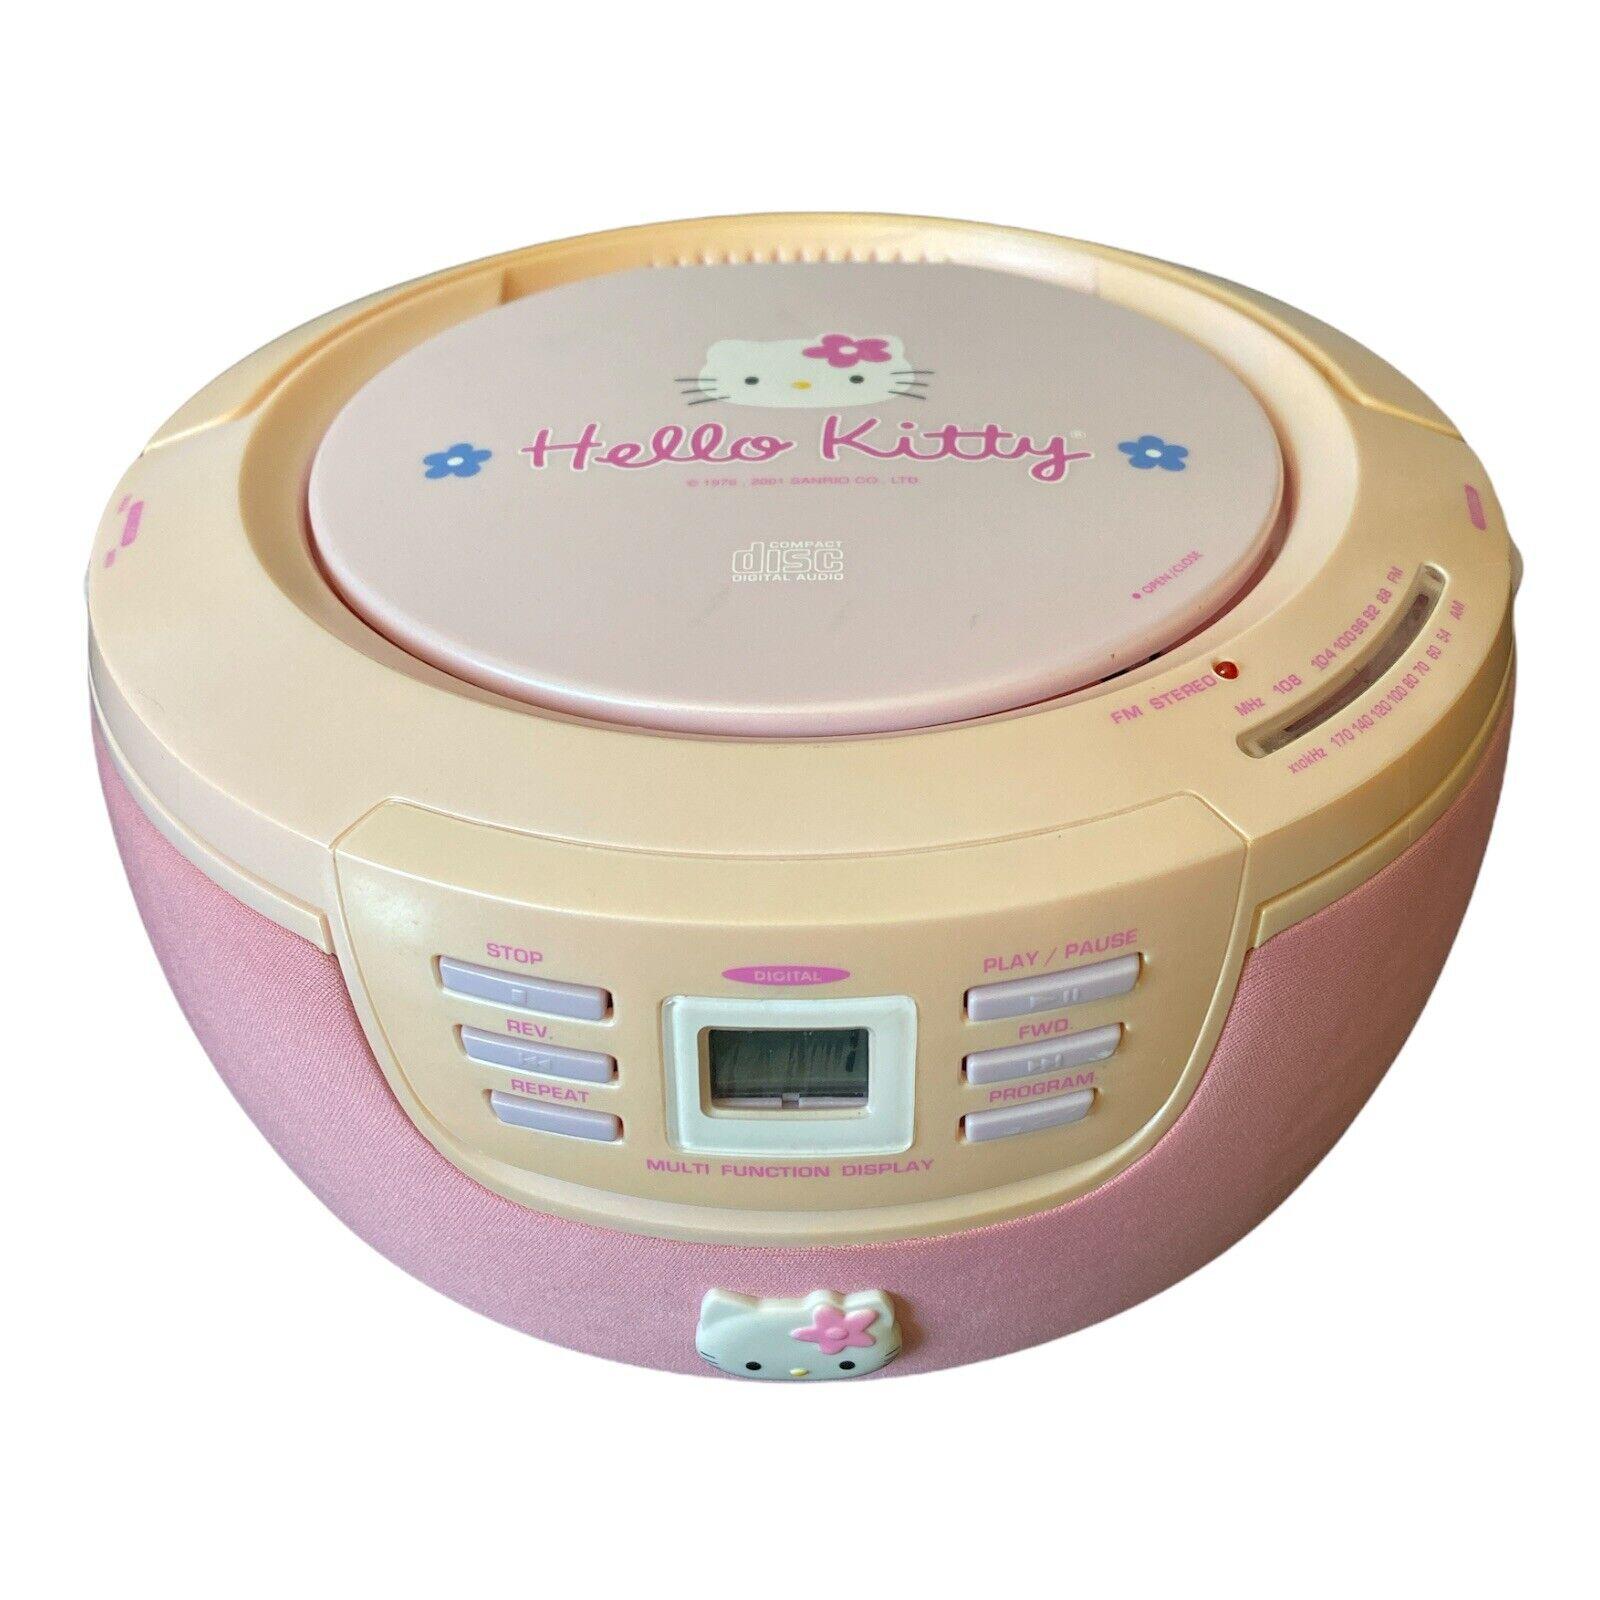 Vintage Hello Kitty   AM/FM/CD Boombox Model No HK23